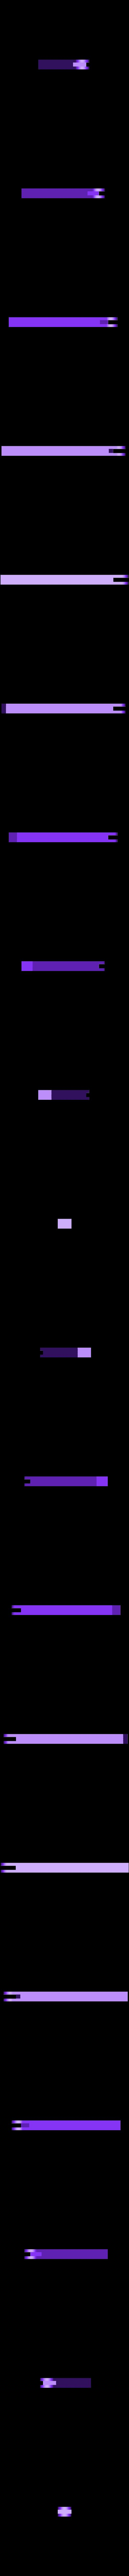 Support_Bar_Top.stl Download free STL file Archimedes Screw Bonanza • 3D printer design, Urulysman